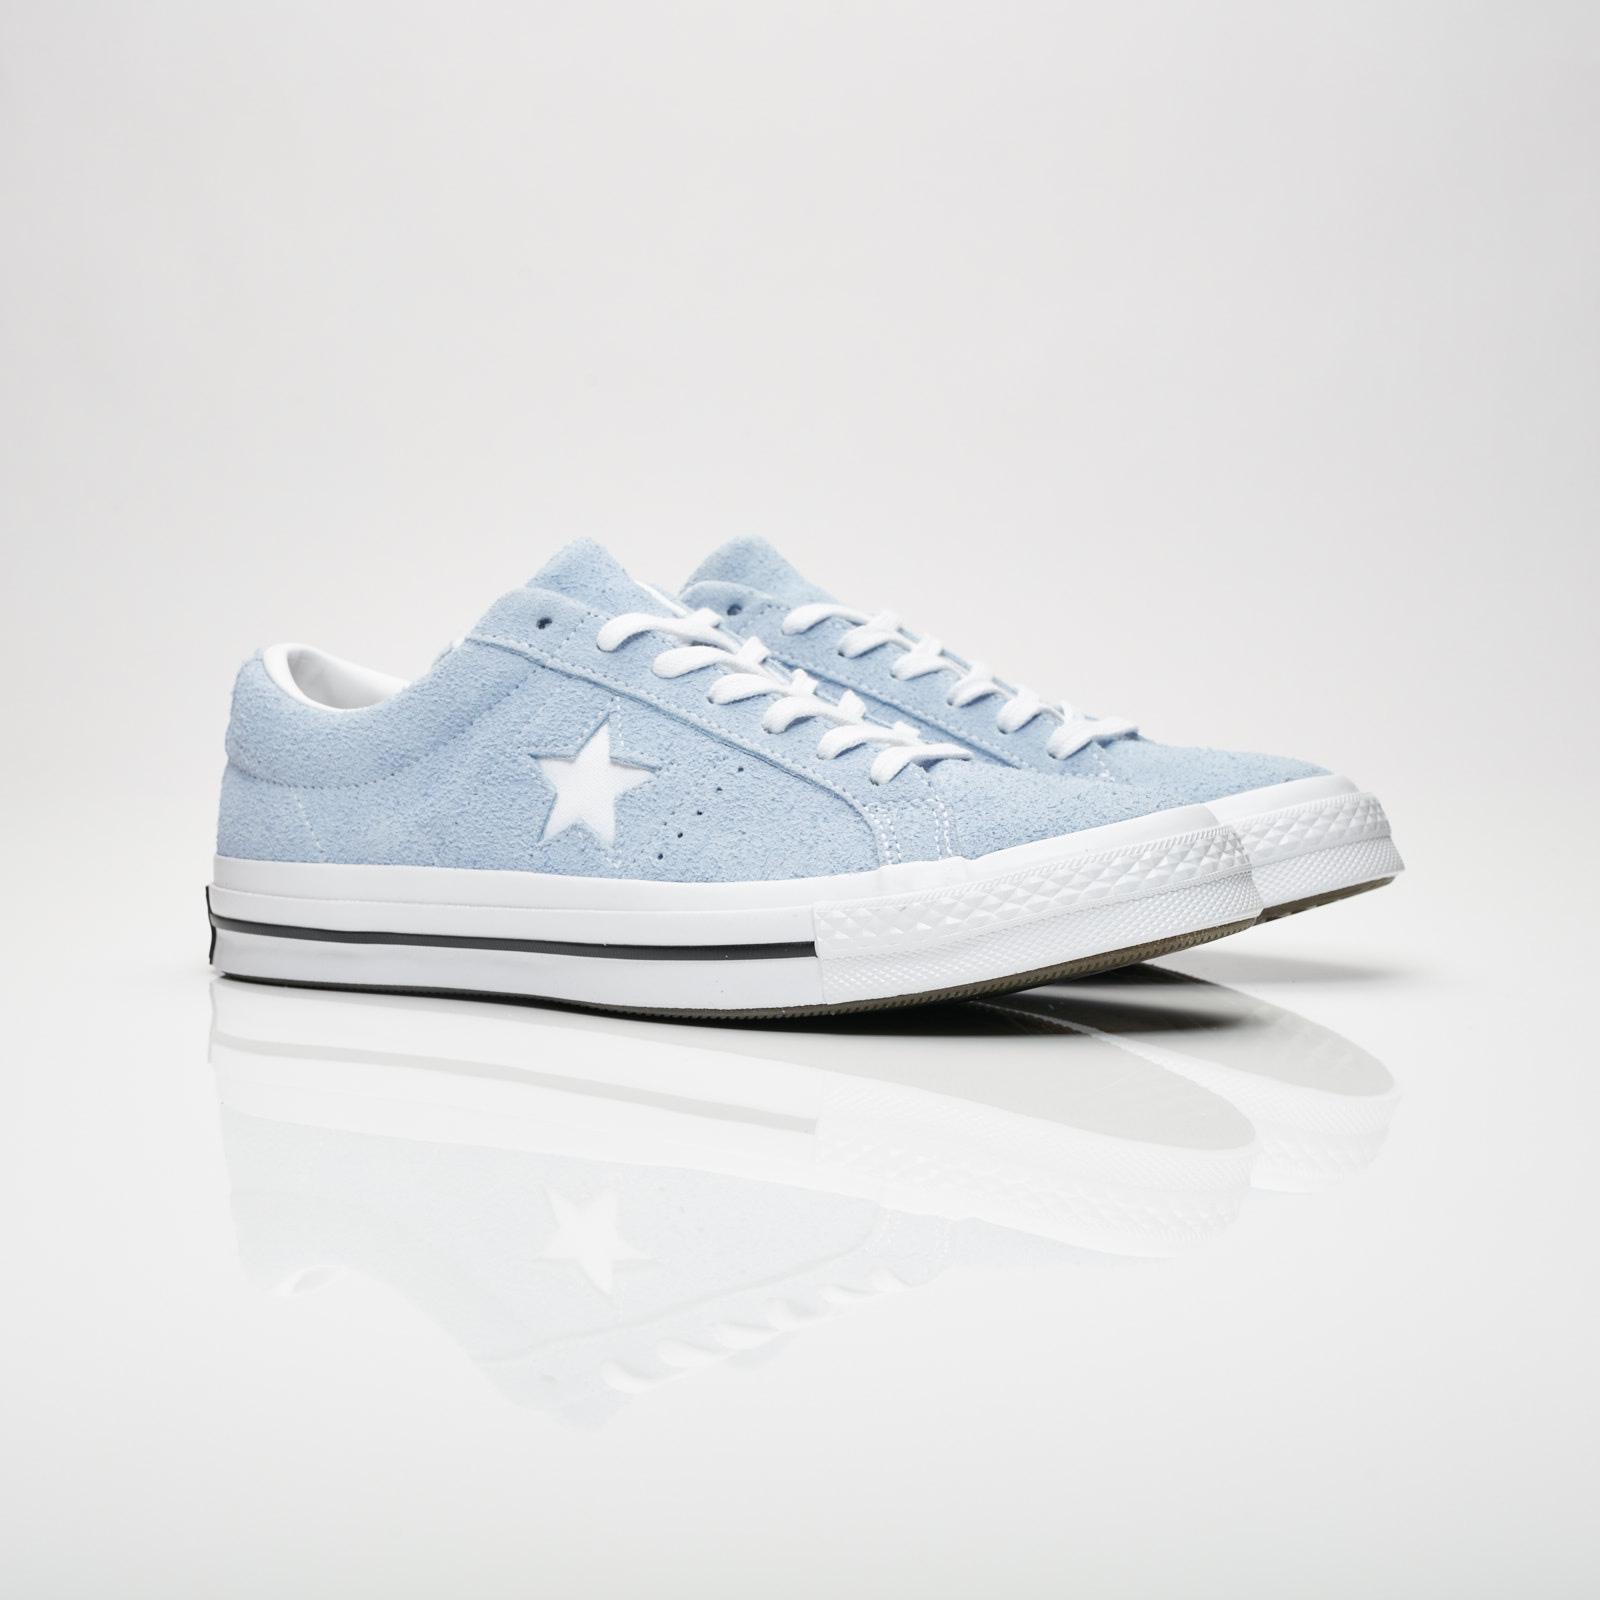 76f6c3cd04c9 Converse One Star OX - 159768c - Sneakersnstuff